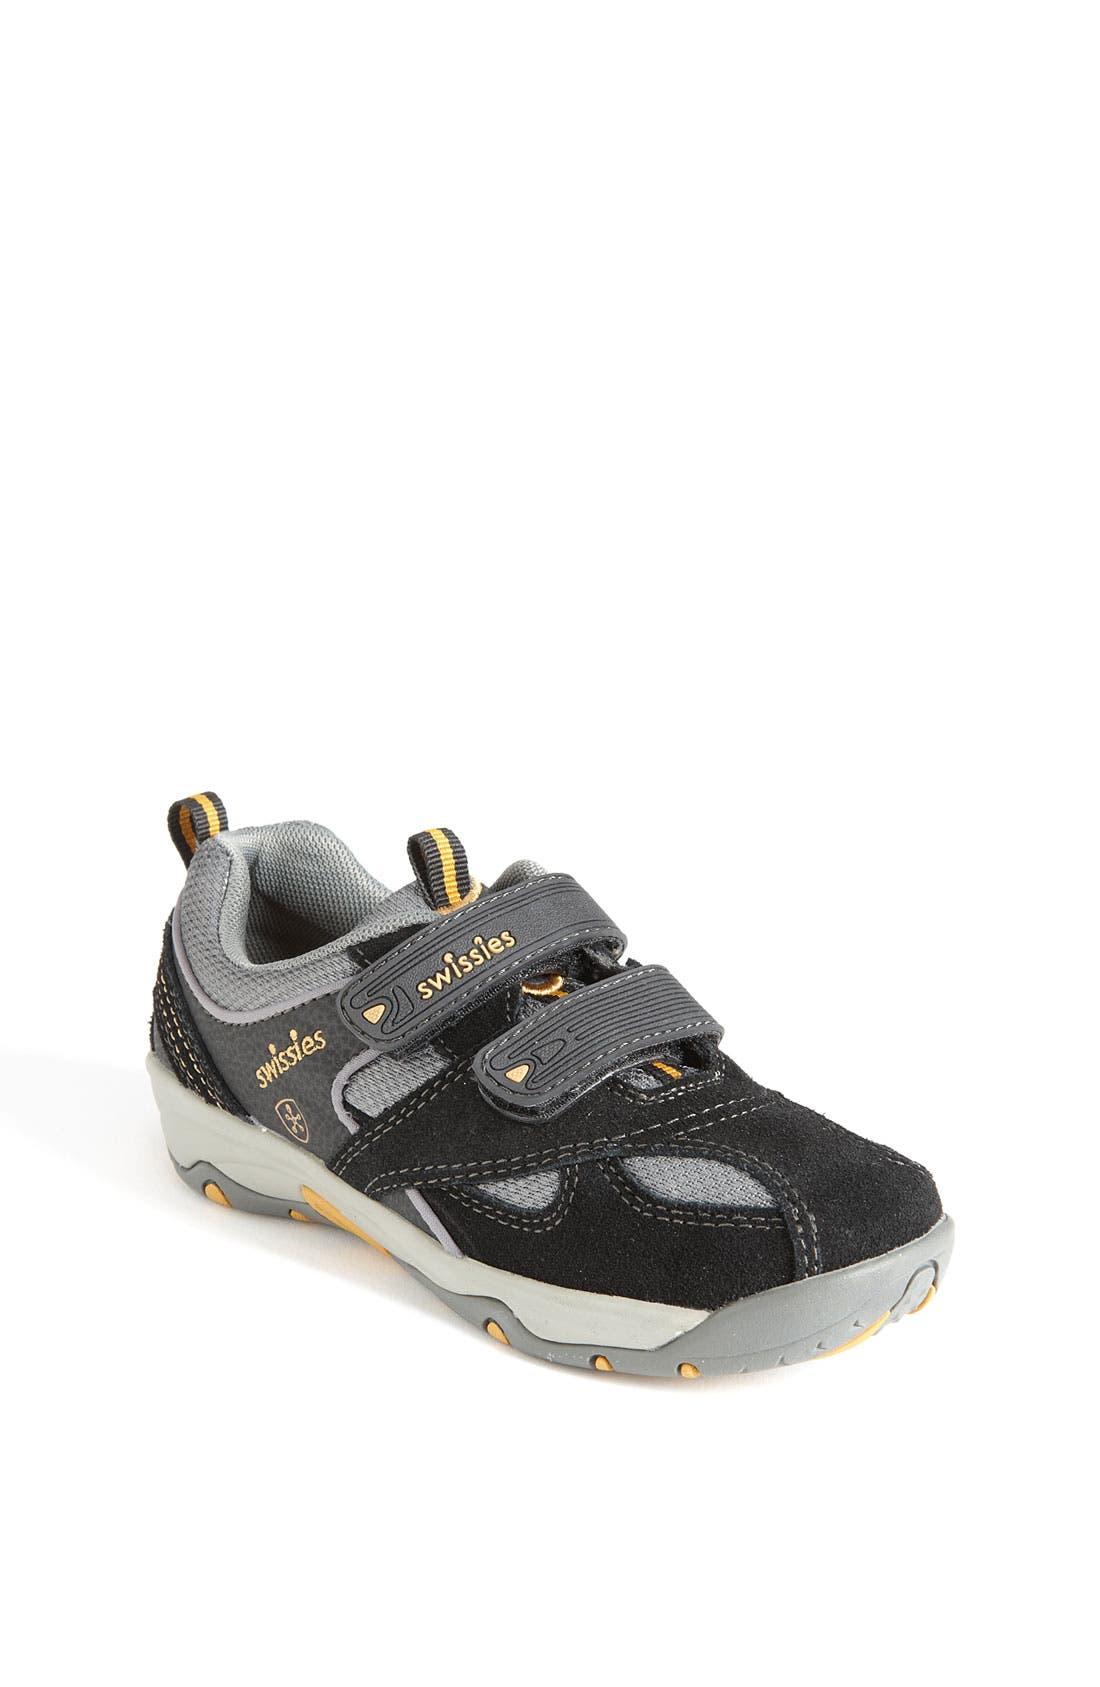 Main Image - Swissies 'Mark' Athletic Sneaker (Toddler, Little Kid & Big Kid)